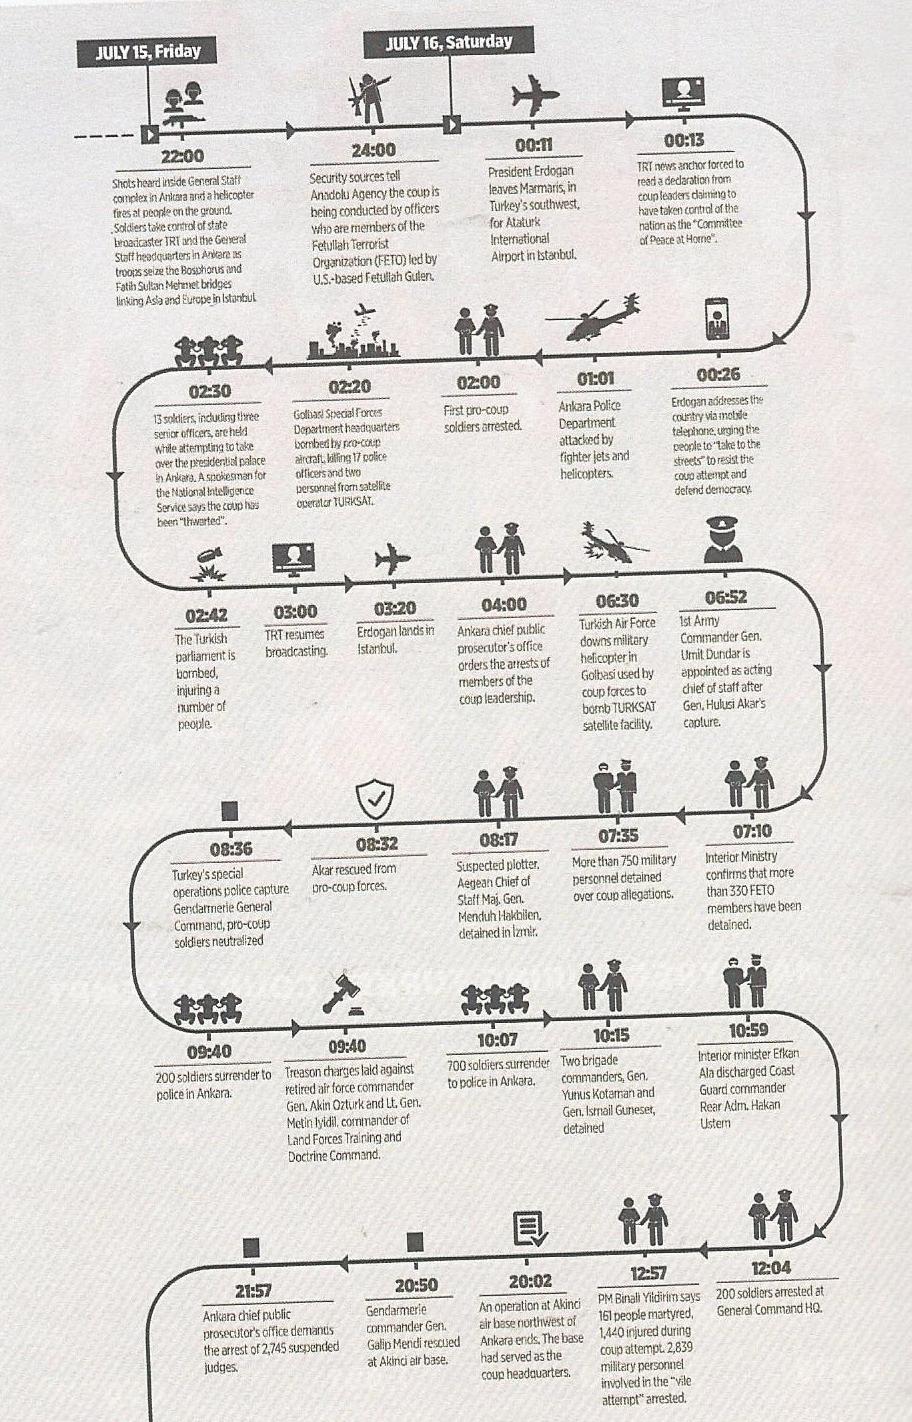 gráfico cronologia 15 julho ditadura